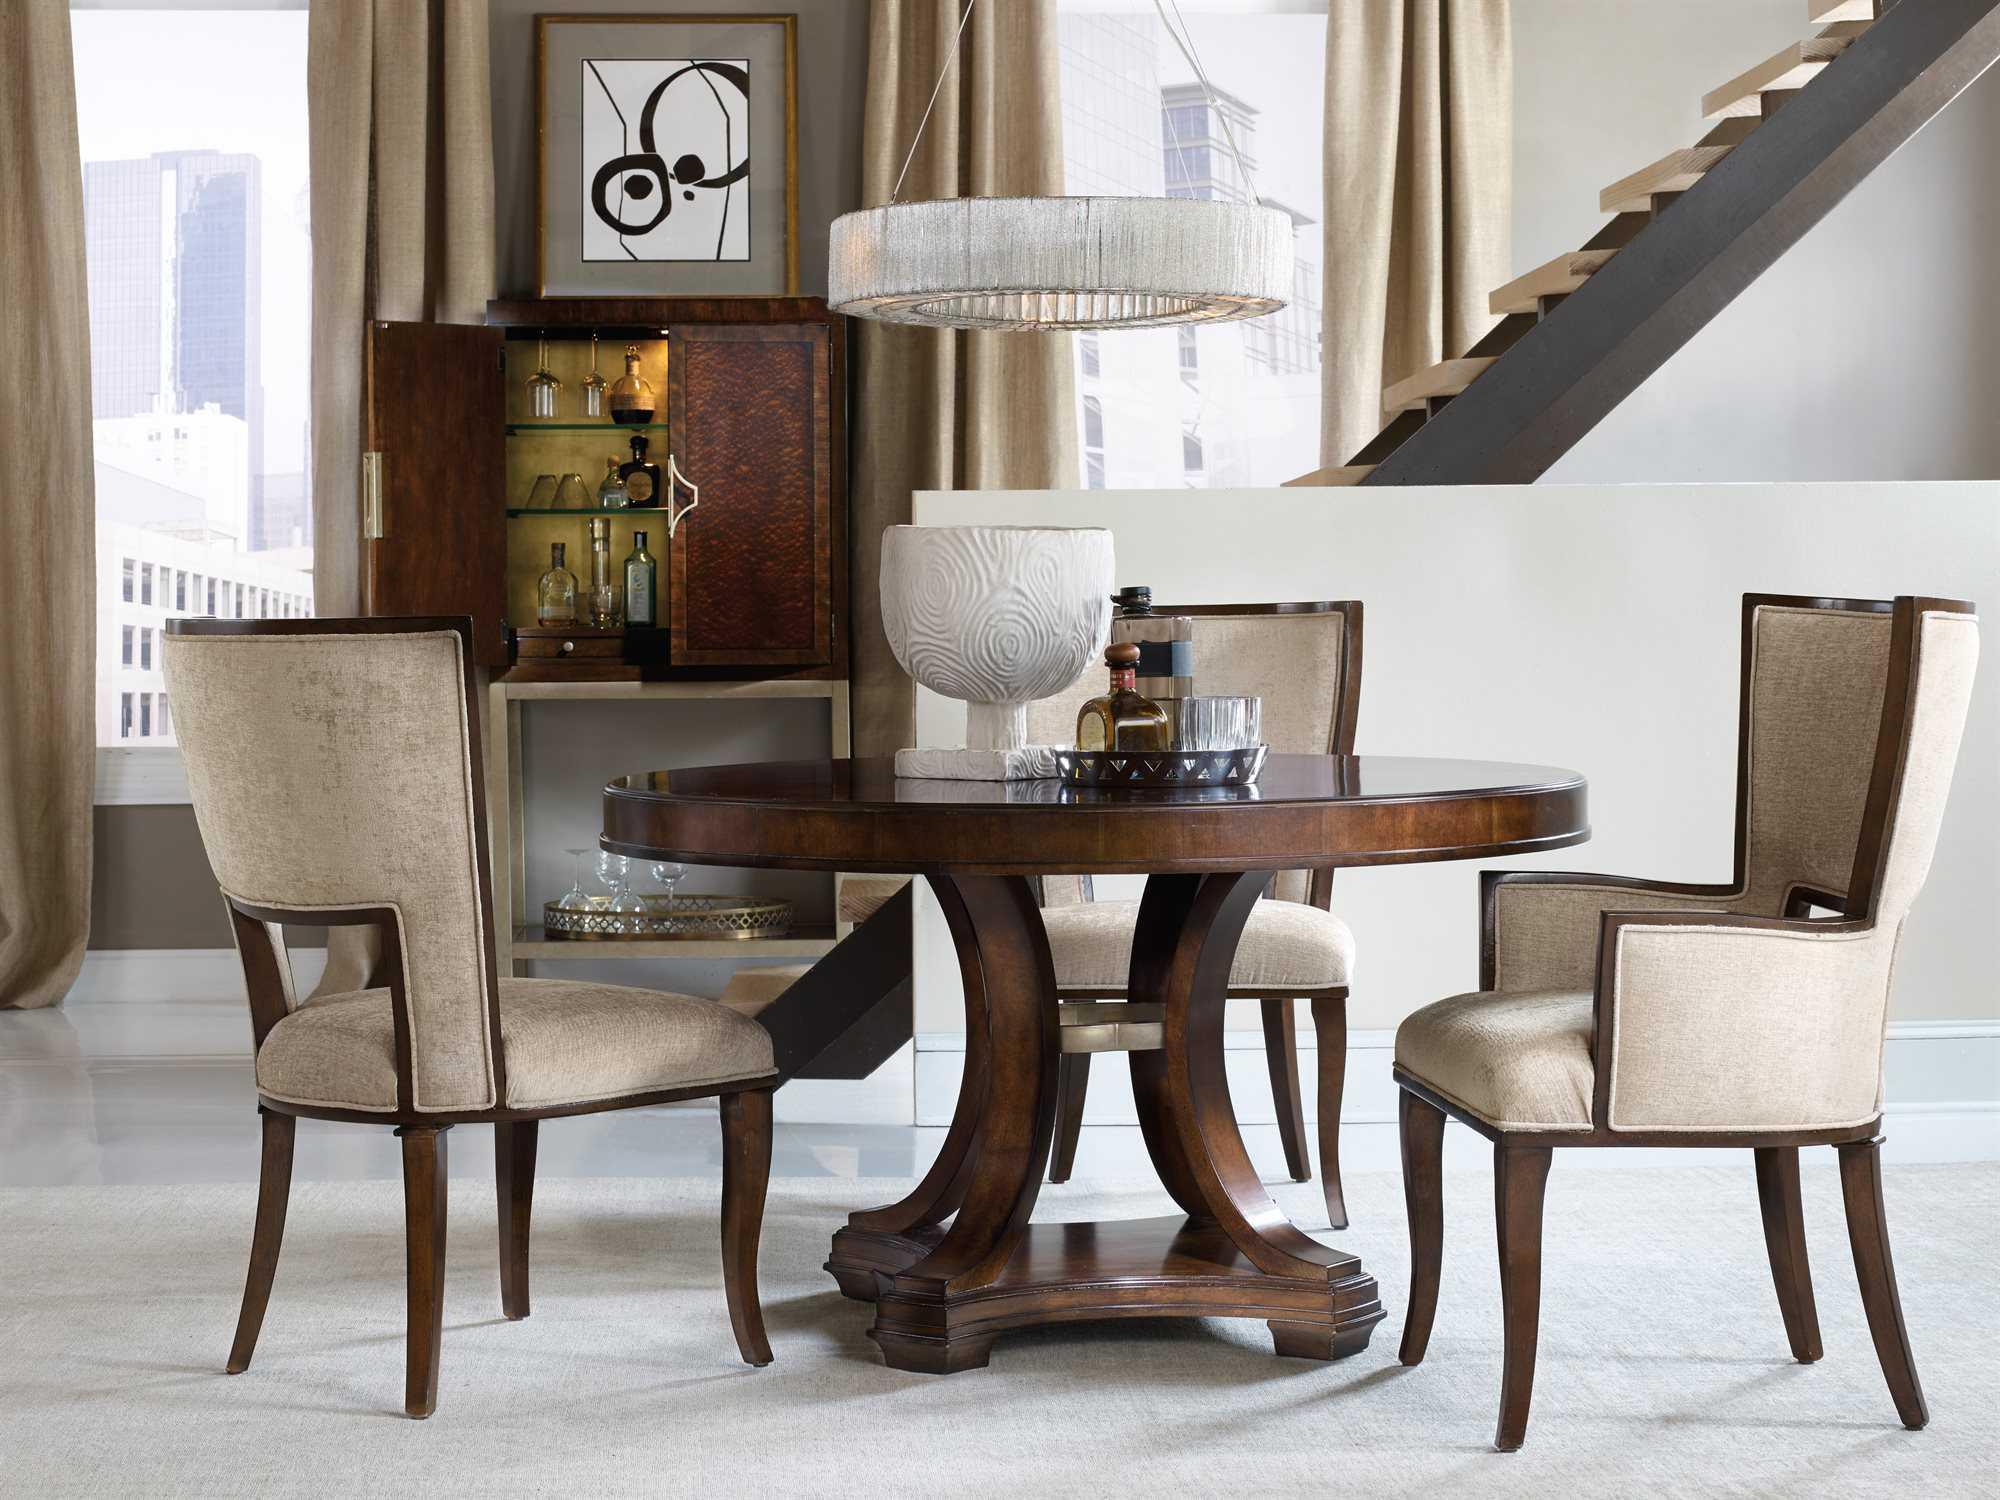 Hooker Furniture Skyline Dining Room Set Hoo533675203set